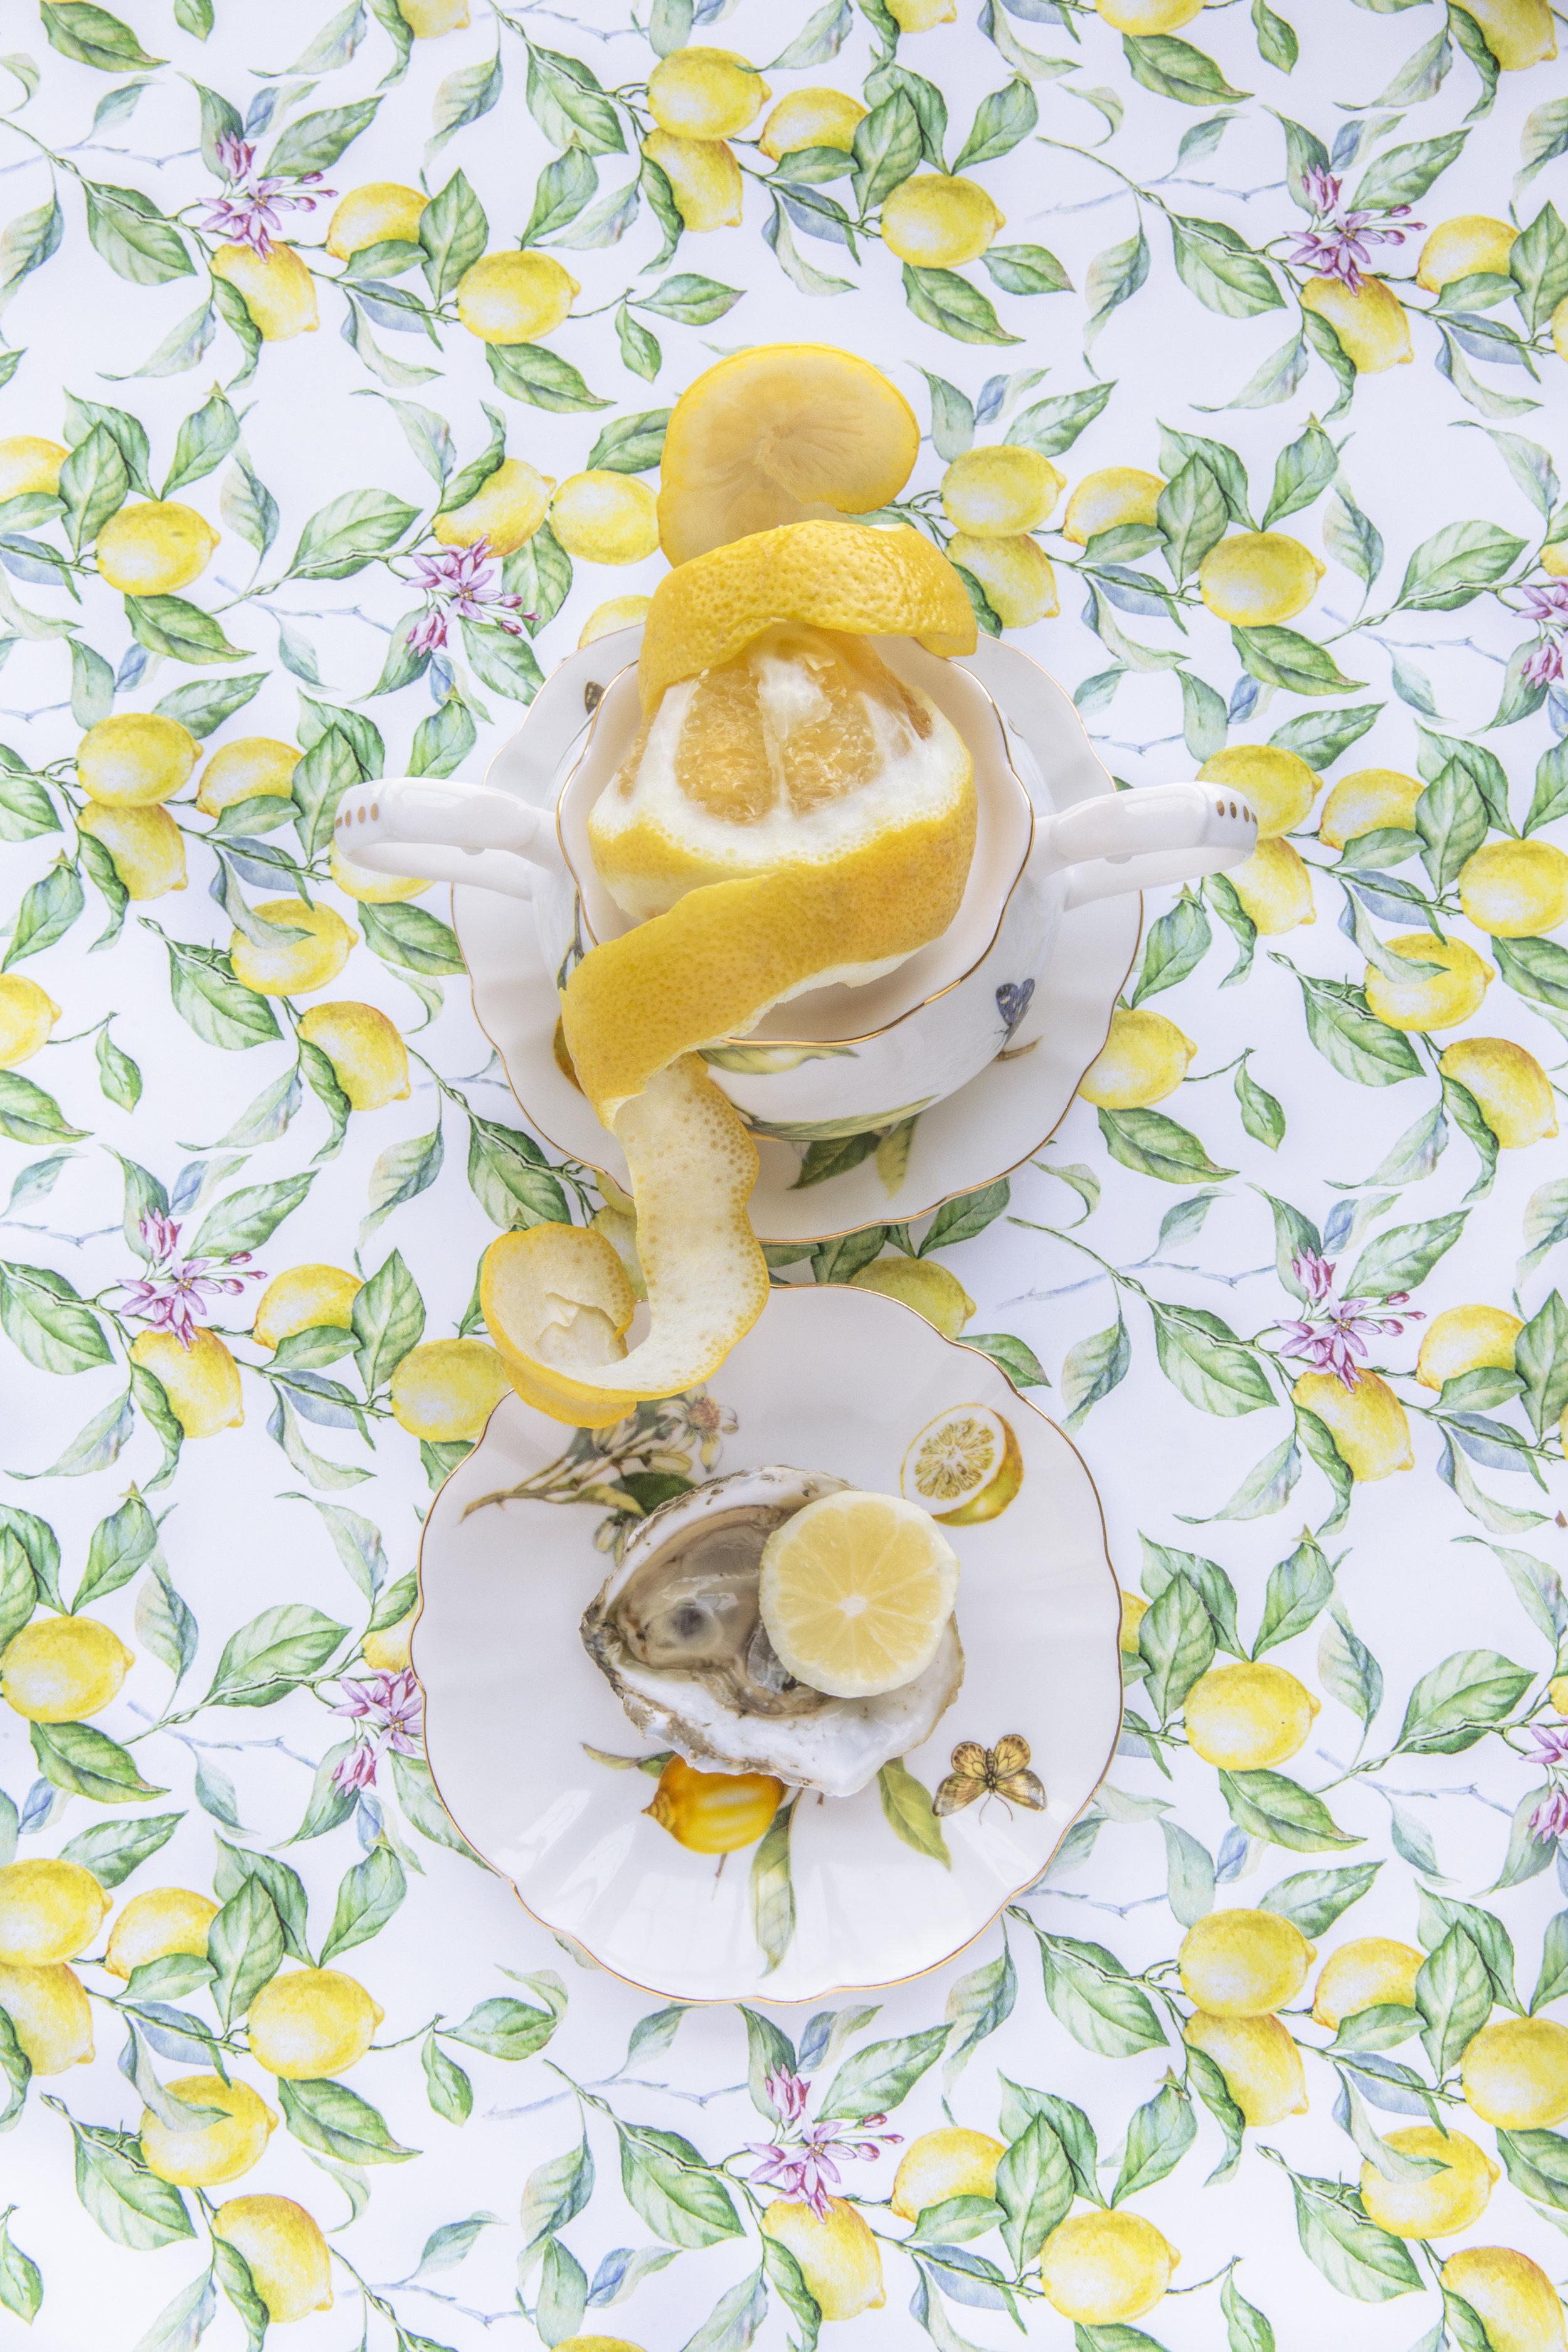 Gracie Lemonata with Lemon, 2019